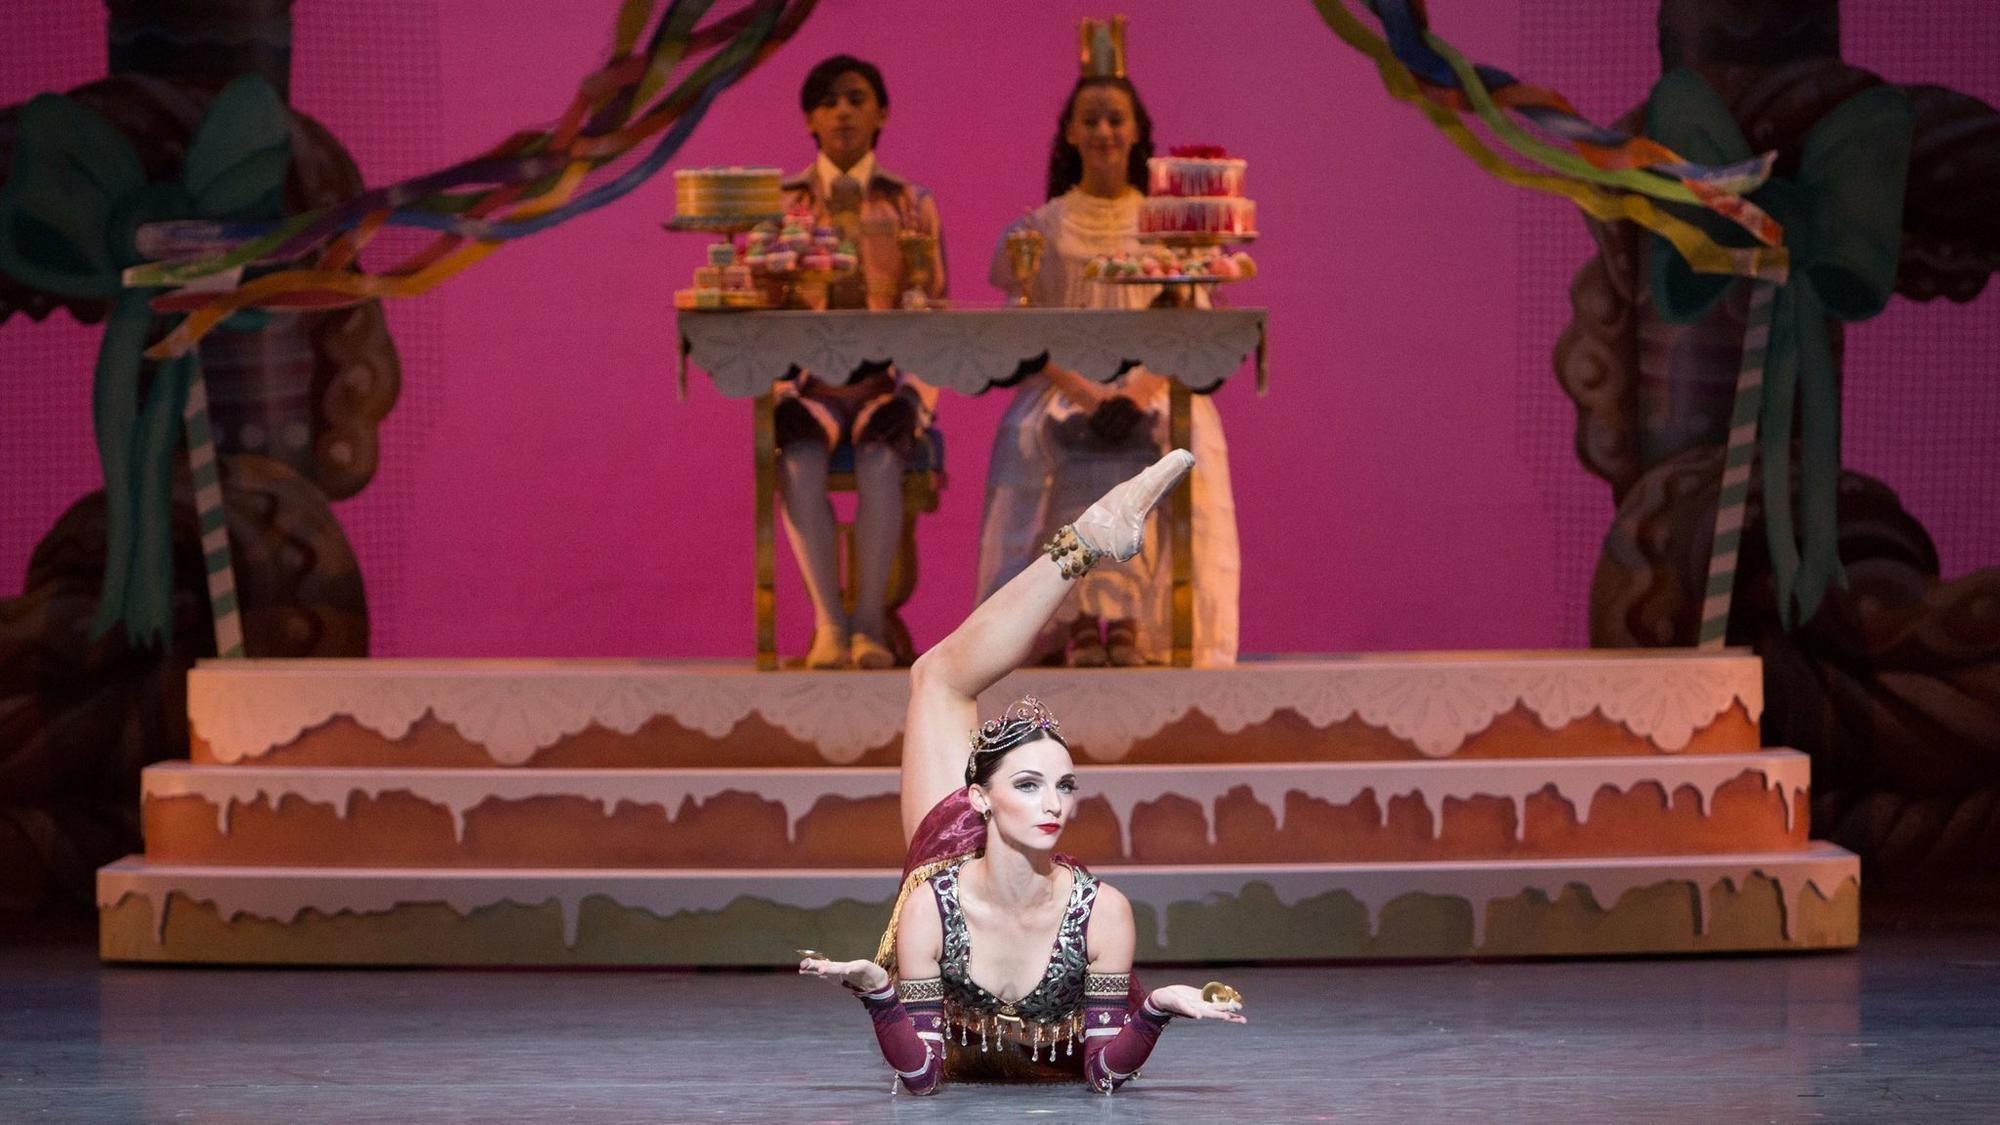 Review In A Season Full Of Nutcracker The Brilliance Of Balanchine Shines Through City Ballet Nutcracker Ballet Music Centers